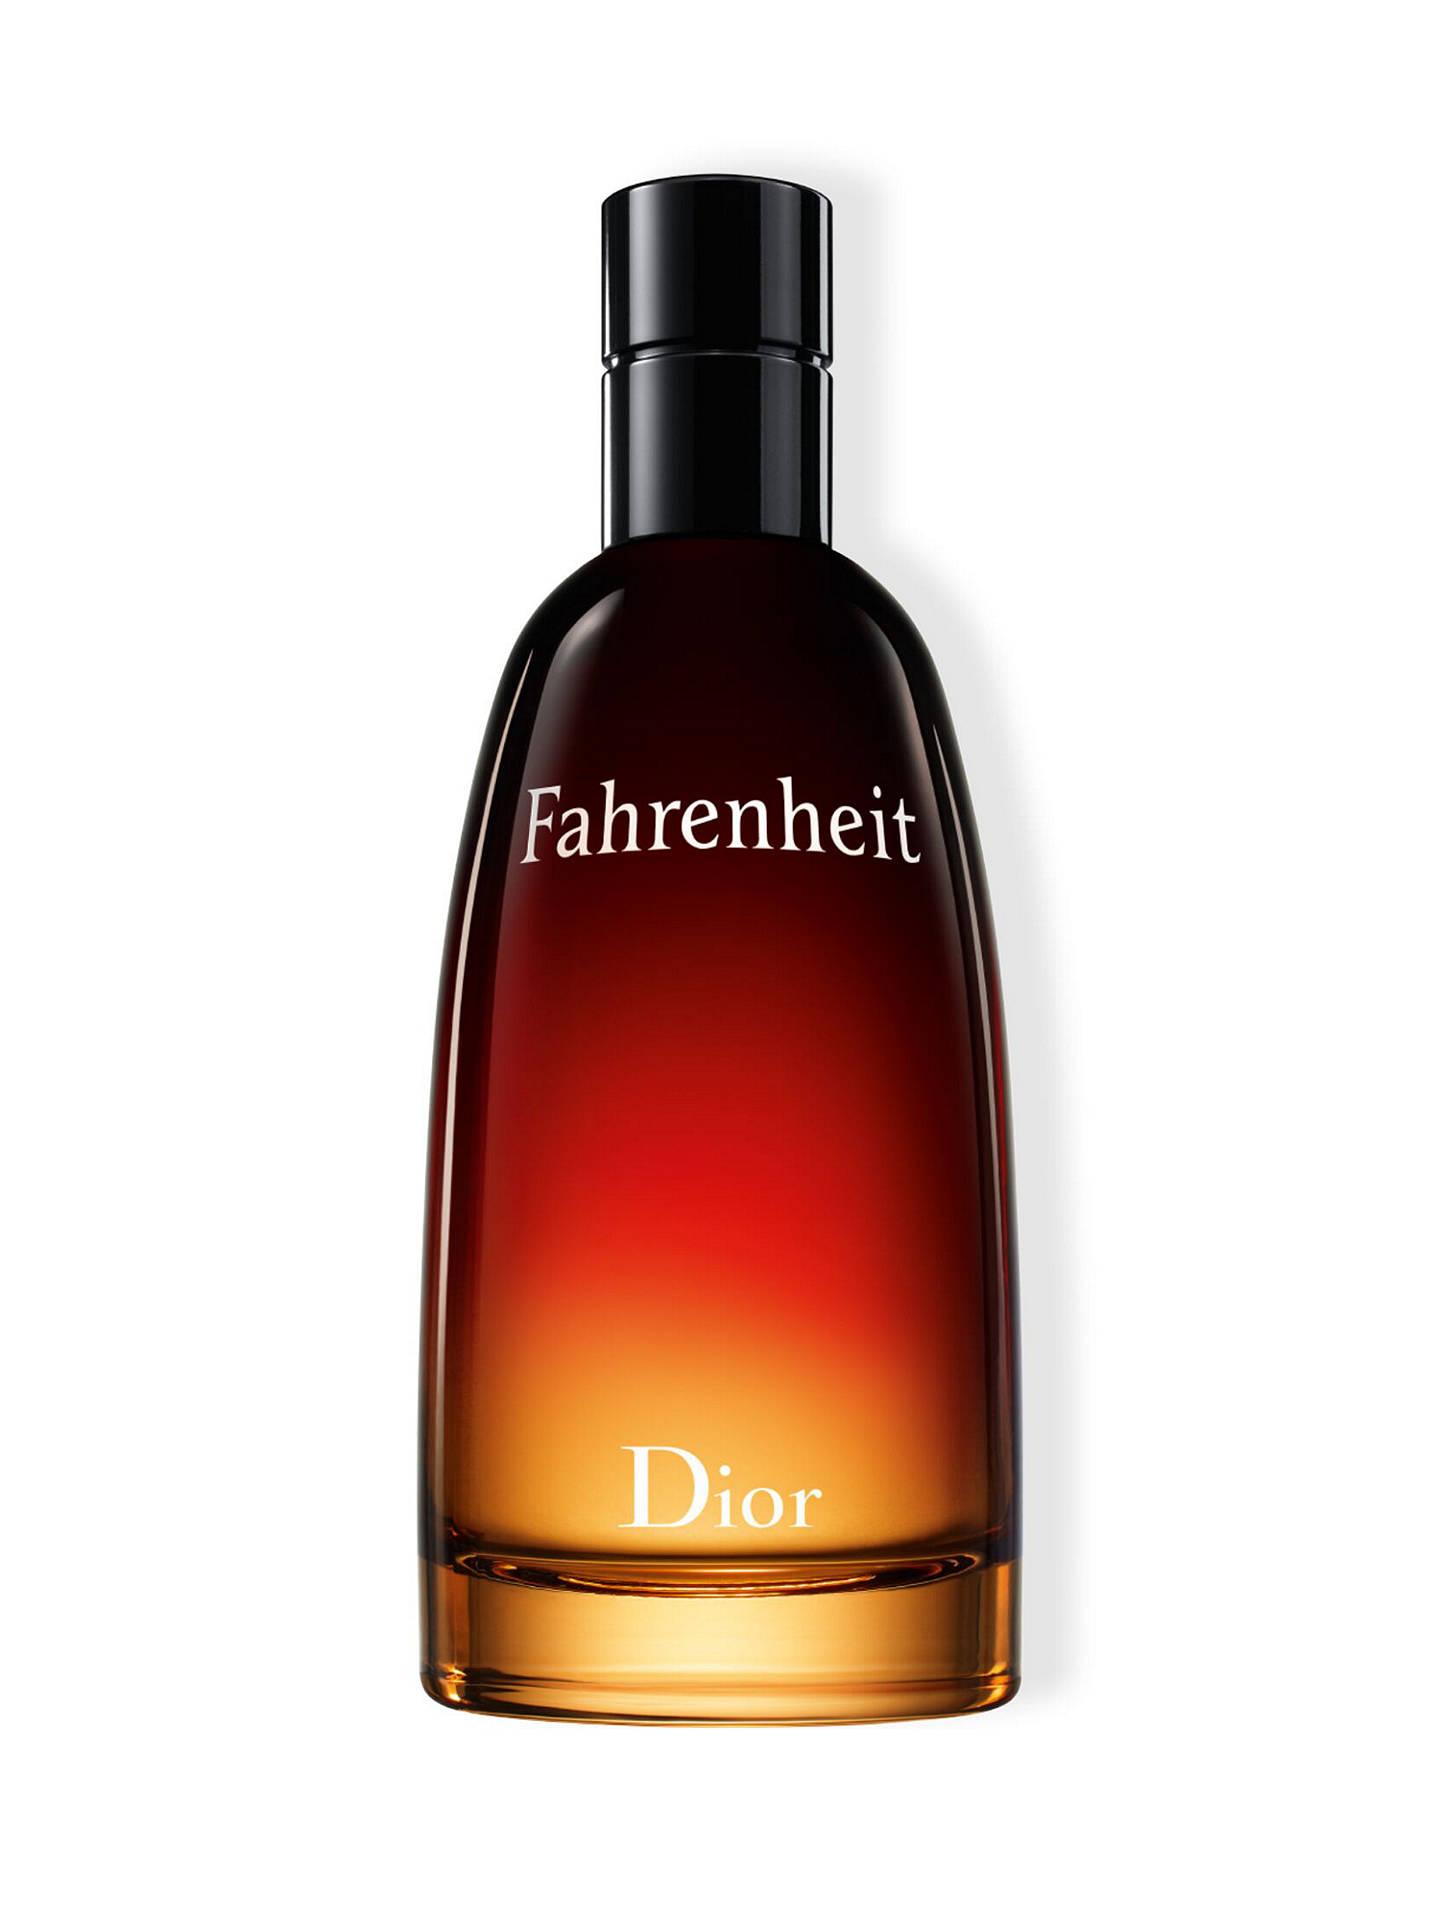 Dior Fahrenheit Eau De Toilette Spray At John Lewis Partners